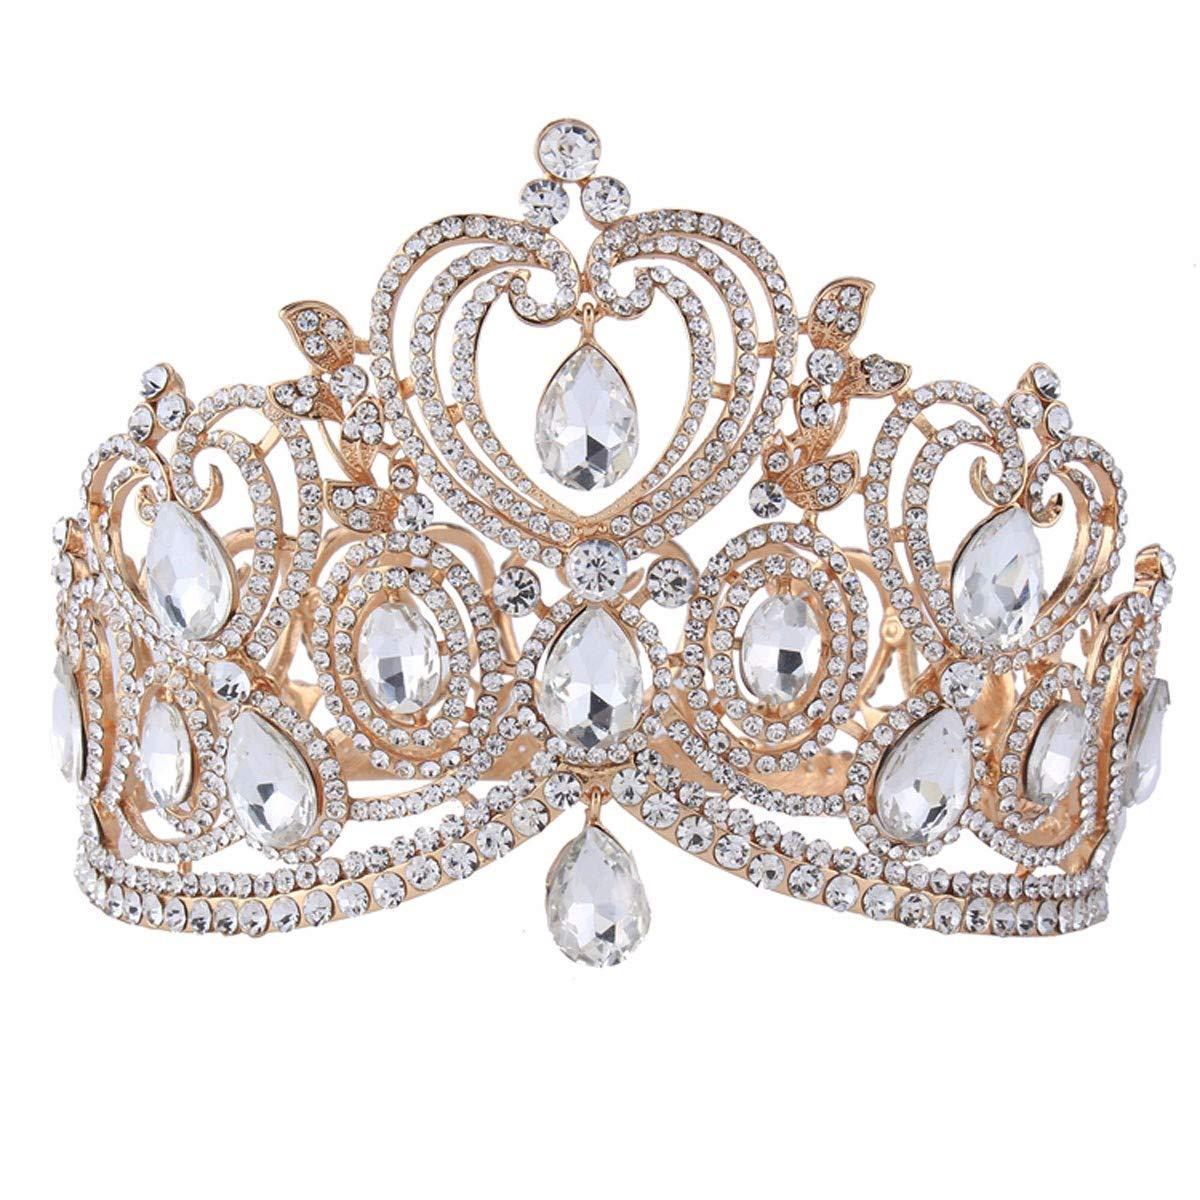 Wedding Crown, Beautiful headdress/Queen'S Baroque Crown Decorations Bride'S Crown Luxurious Atmosphere Court Photo Studio Accessories Accessories.